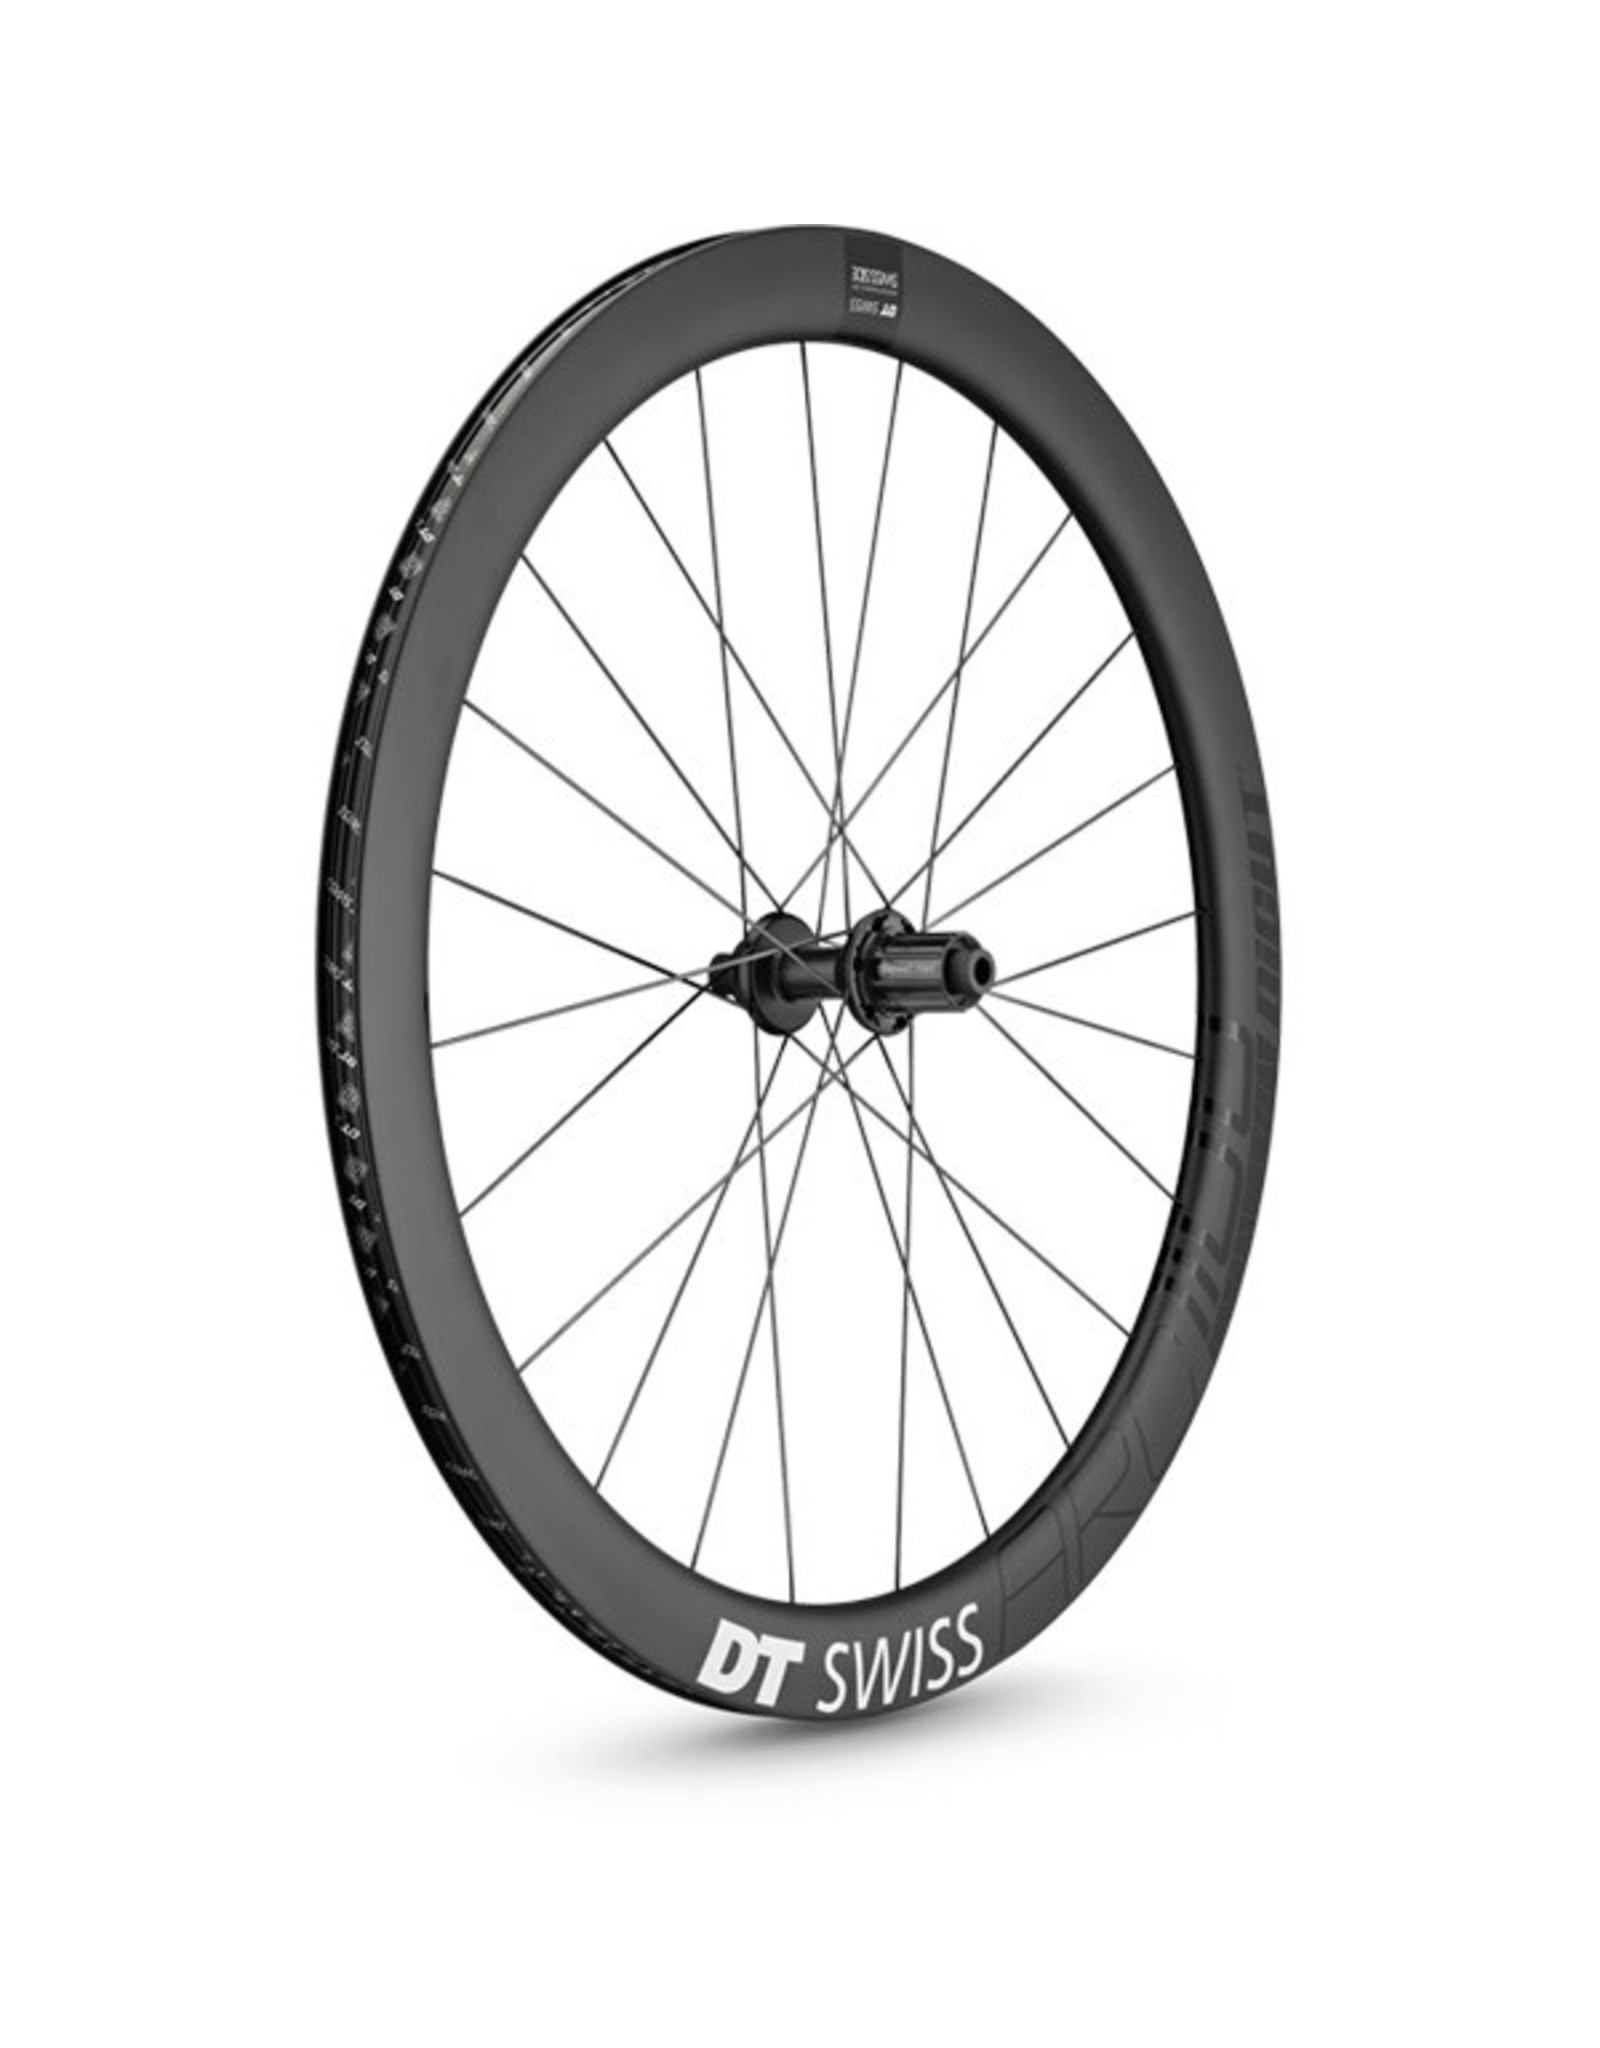 DT Swiss Wheel Disc Brake ARC1100 48mm